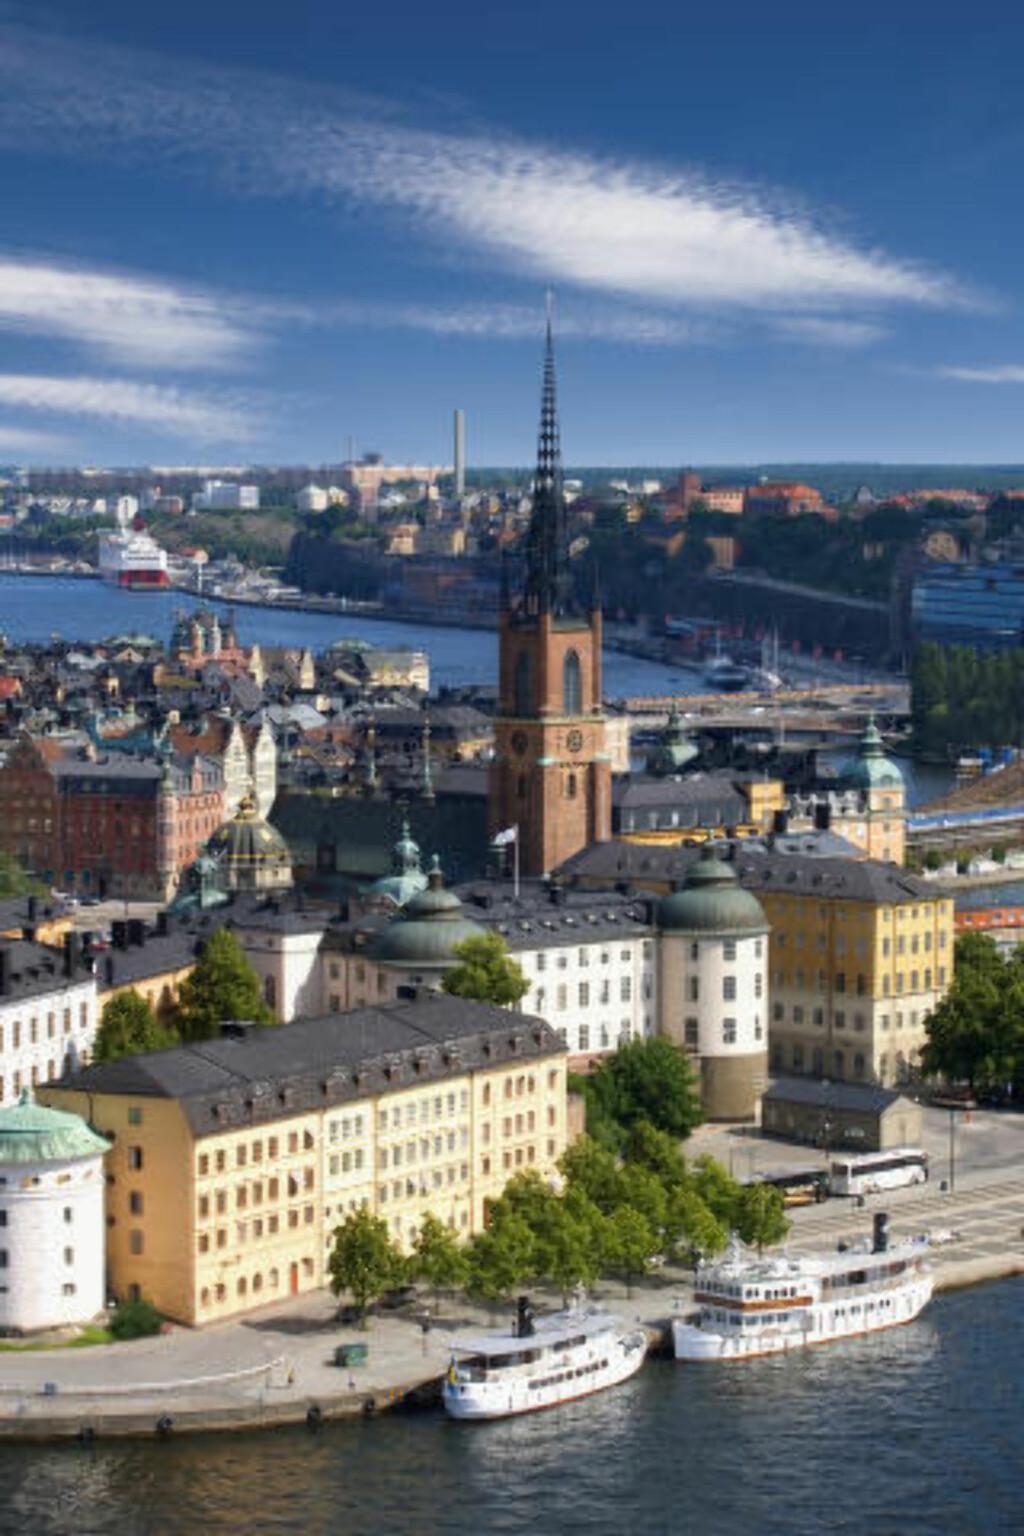 NUMMER TRE: Stockholm har tredje best rykte i verden, ifølge omdømmeinstituttet Reputation Institute. Foto: JEAN-PIERRE LESCOURRET / CORBIS / NTB SCANPIX